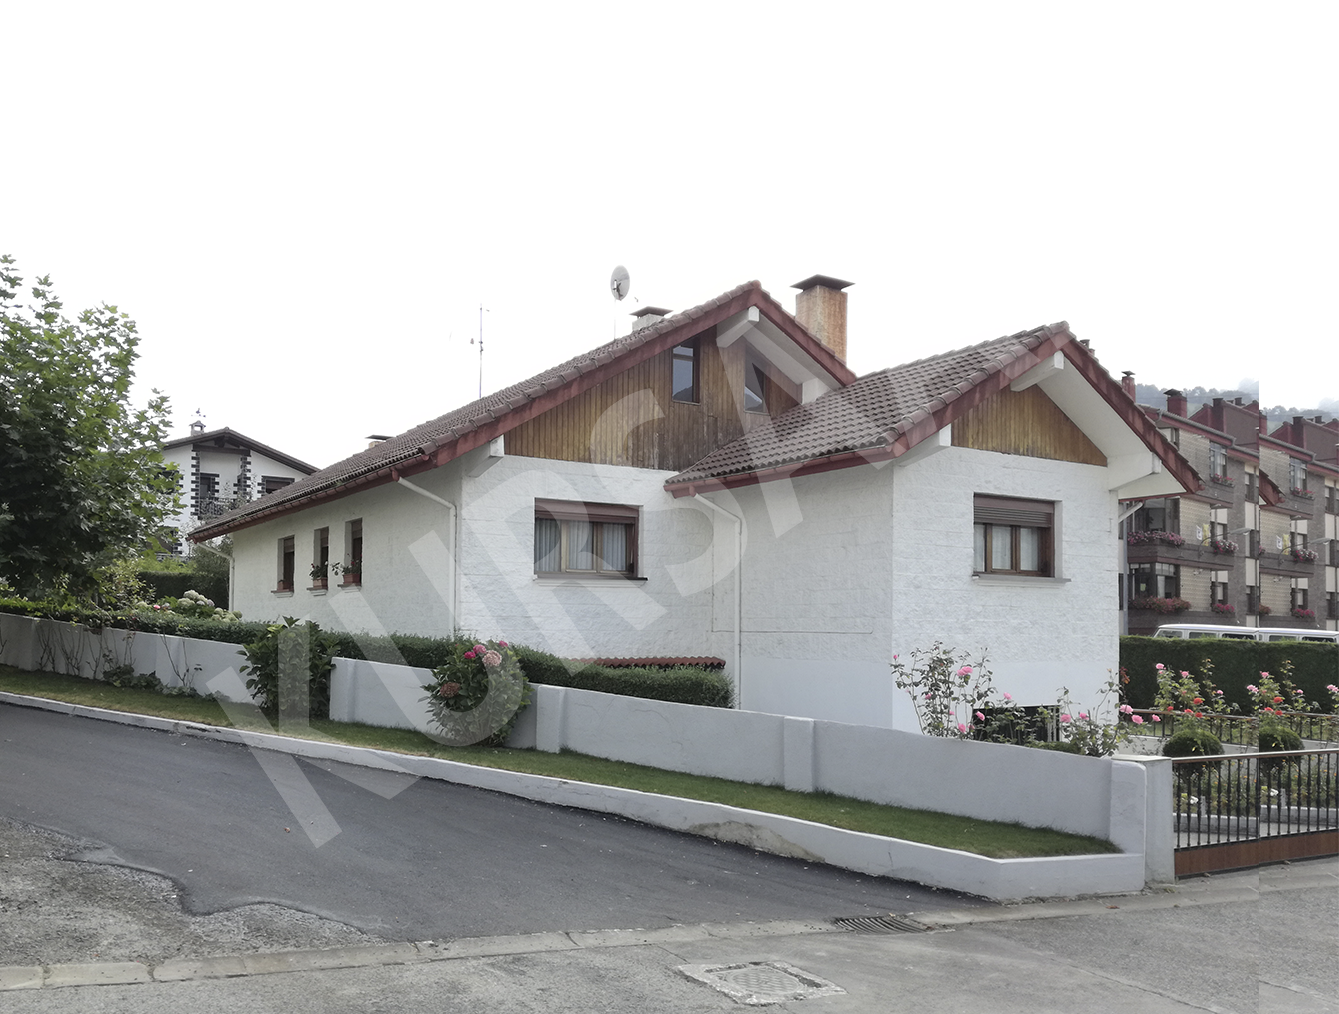 foto 3 - Aislamientos Térmicos y Eficiencia Energética-Patxi Arrazola Kalea, 31880 Leitza, Nafarroa-Leitza